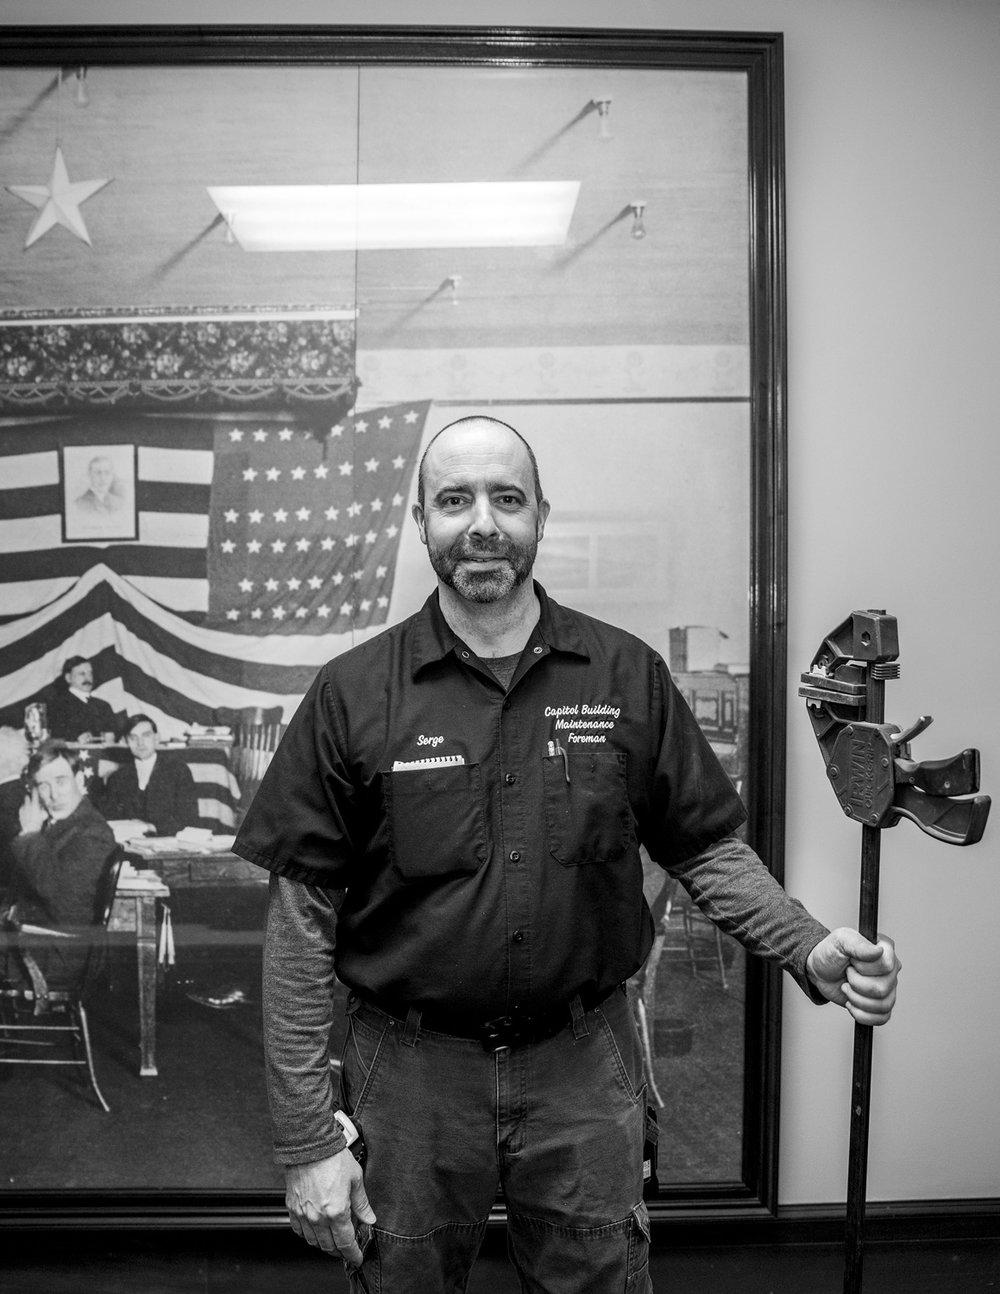 Serge Lesh, Capitol Building Maintenance Foreman